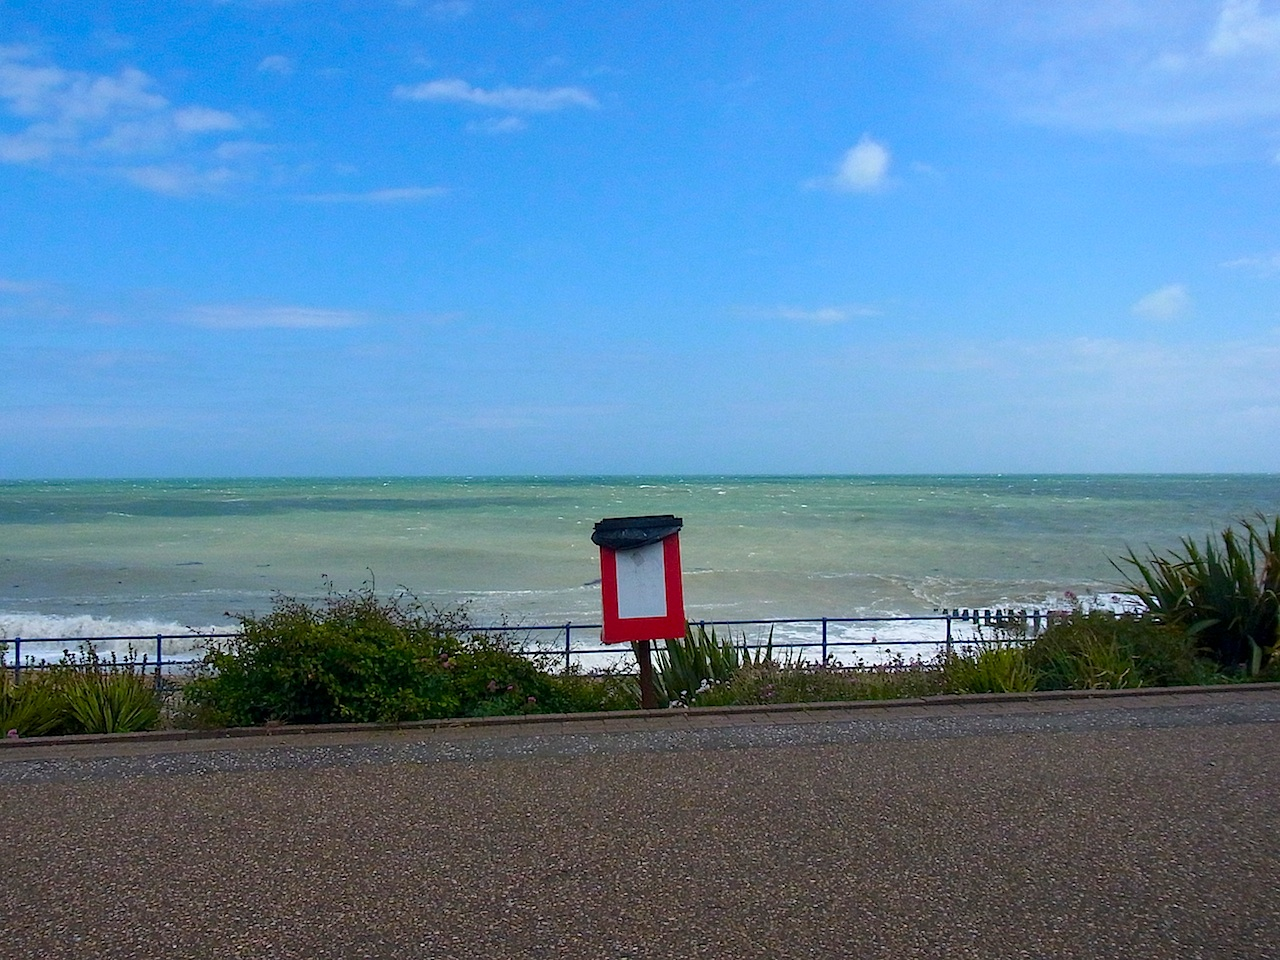 eastbournesea6.jpg